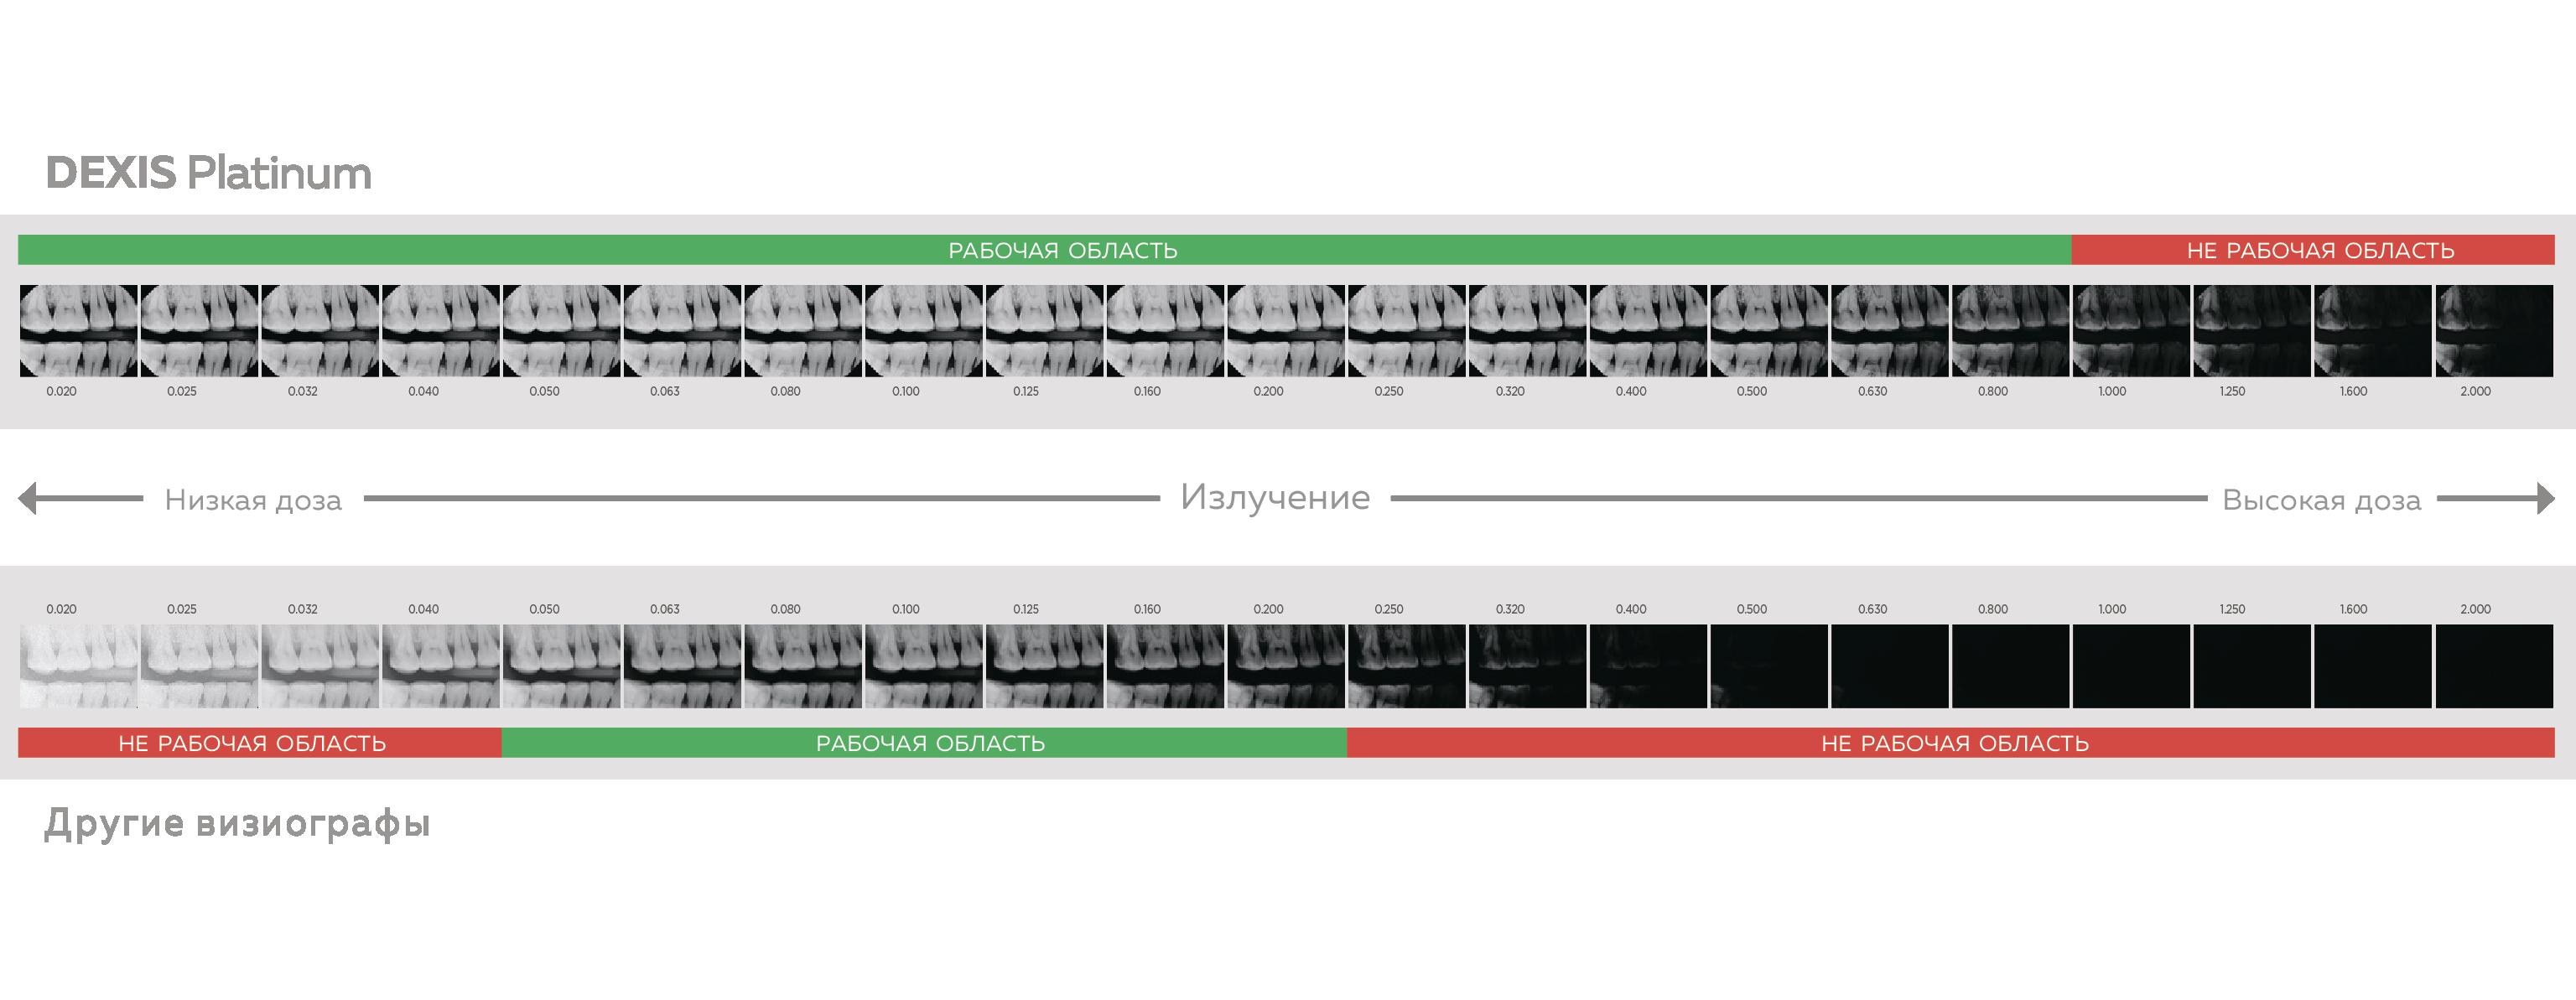 DEXIS Platinum - цифровой радиовизиограф премиум класса